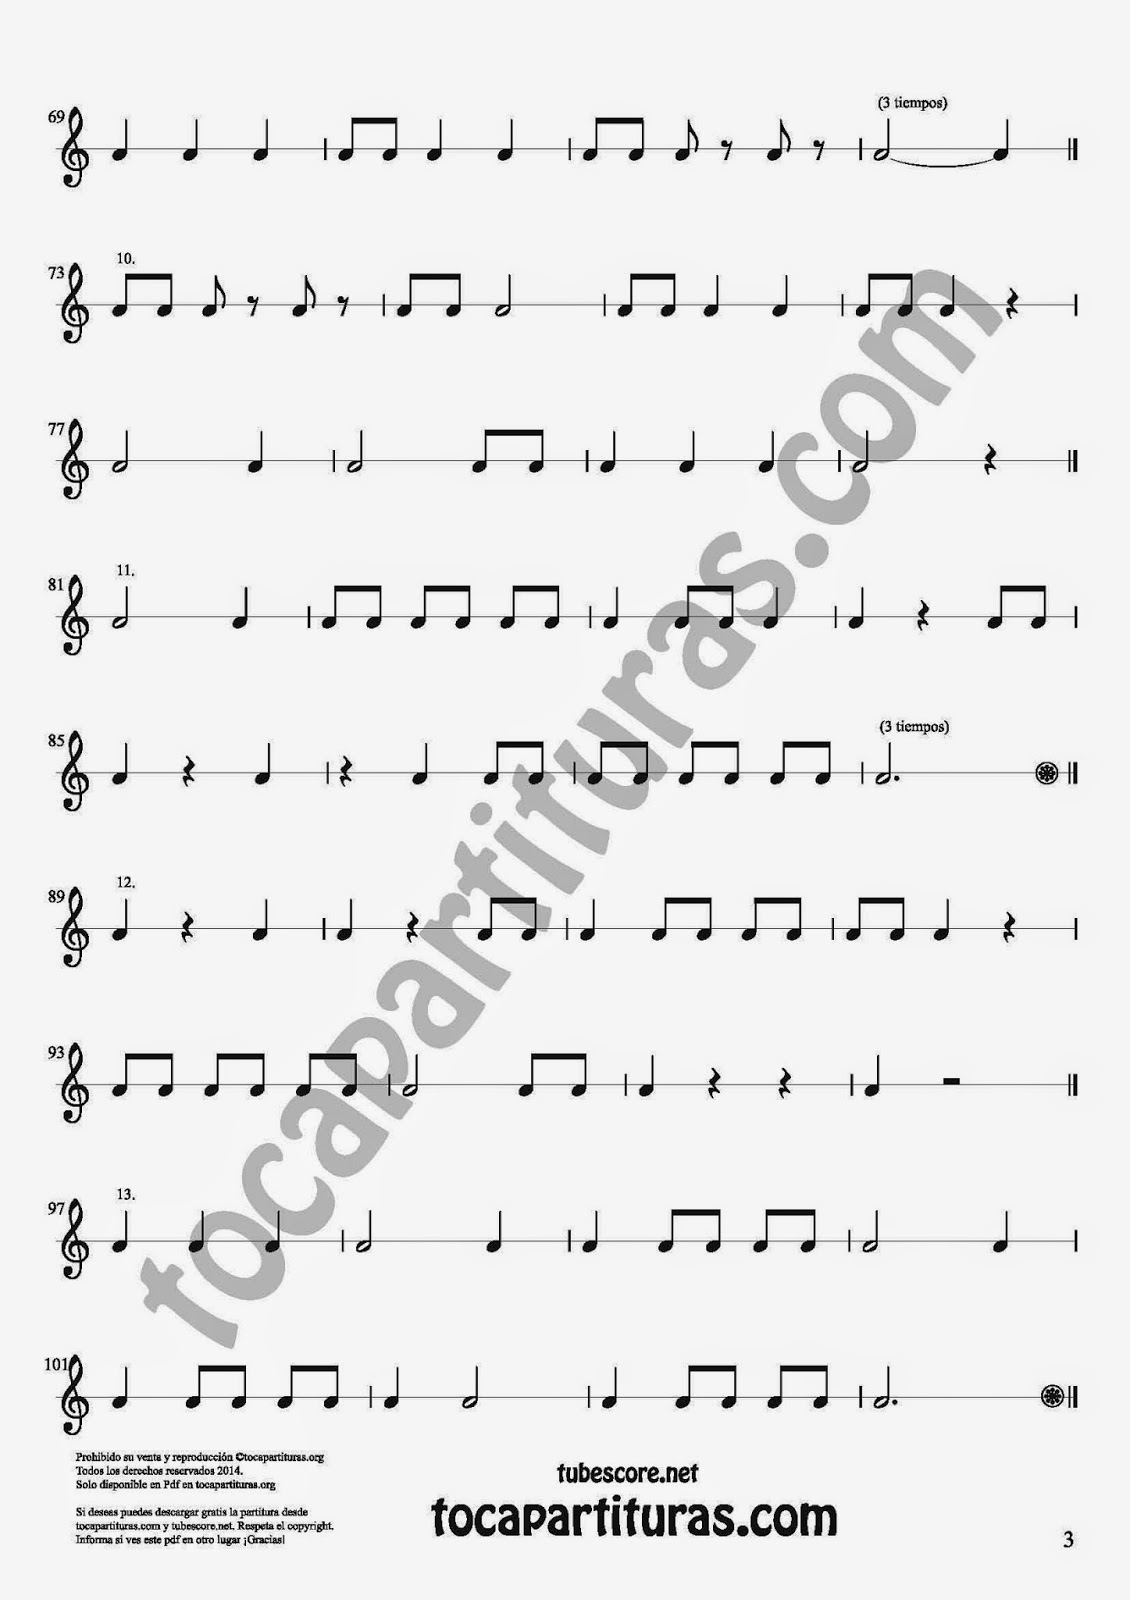 Ejercicios Ritmicos Para Guitarra 3 17 Ejercicios Rítmicos Para